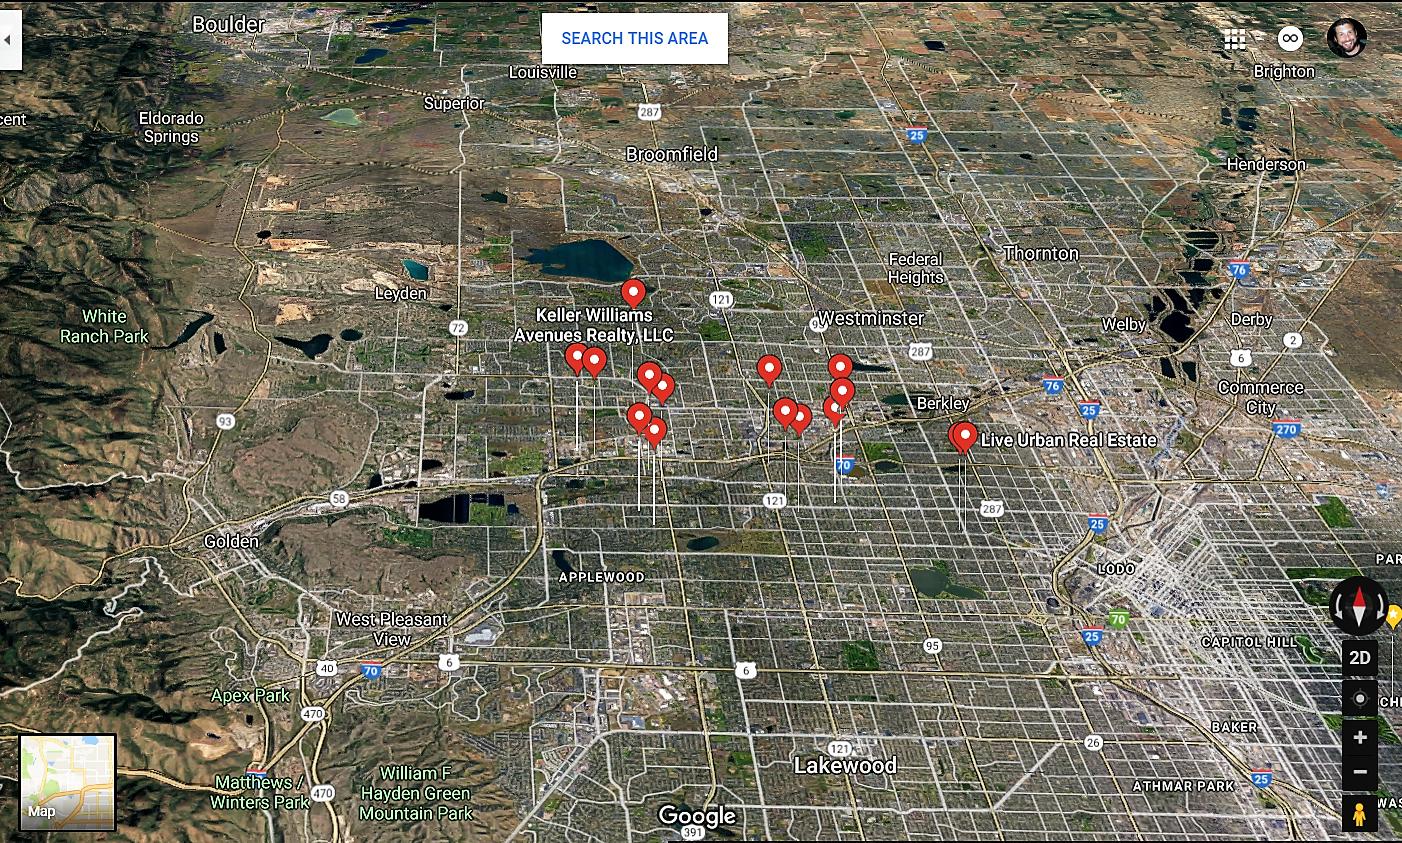 Wheat Ridge Colorado Google Maps Real Estate Realtors and Mortgage Loans